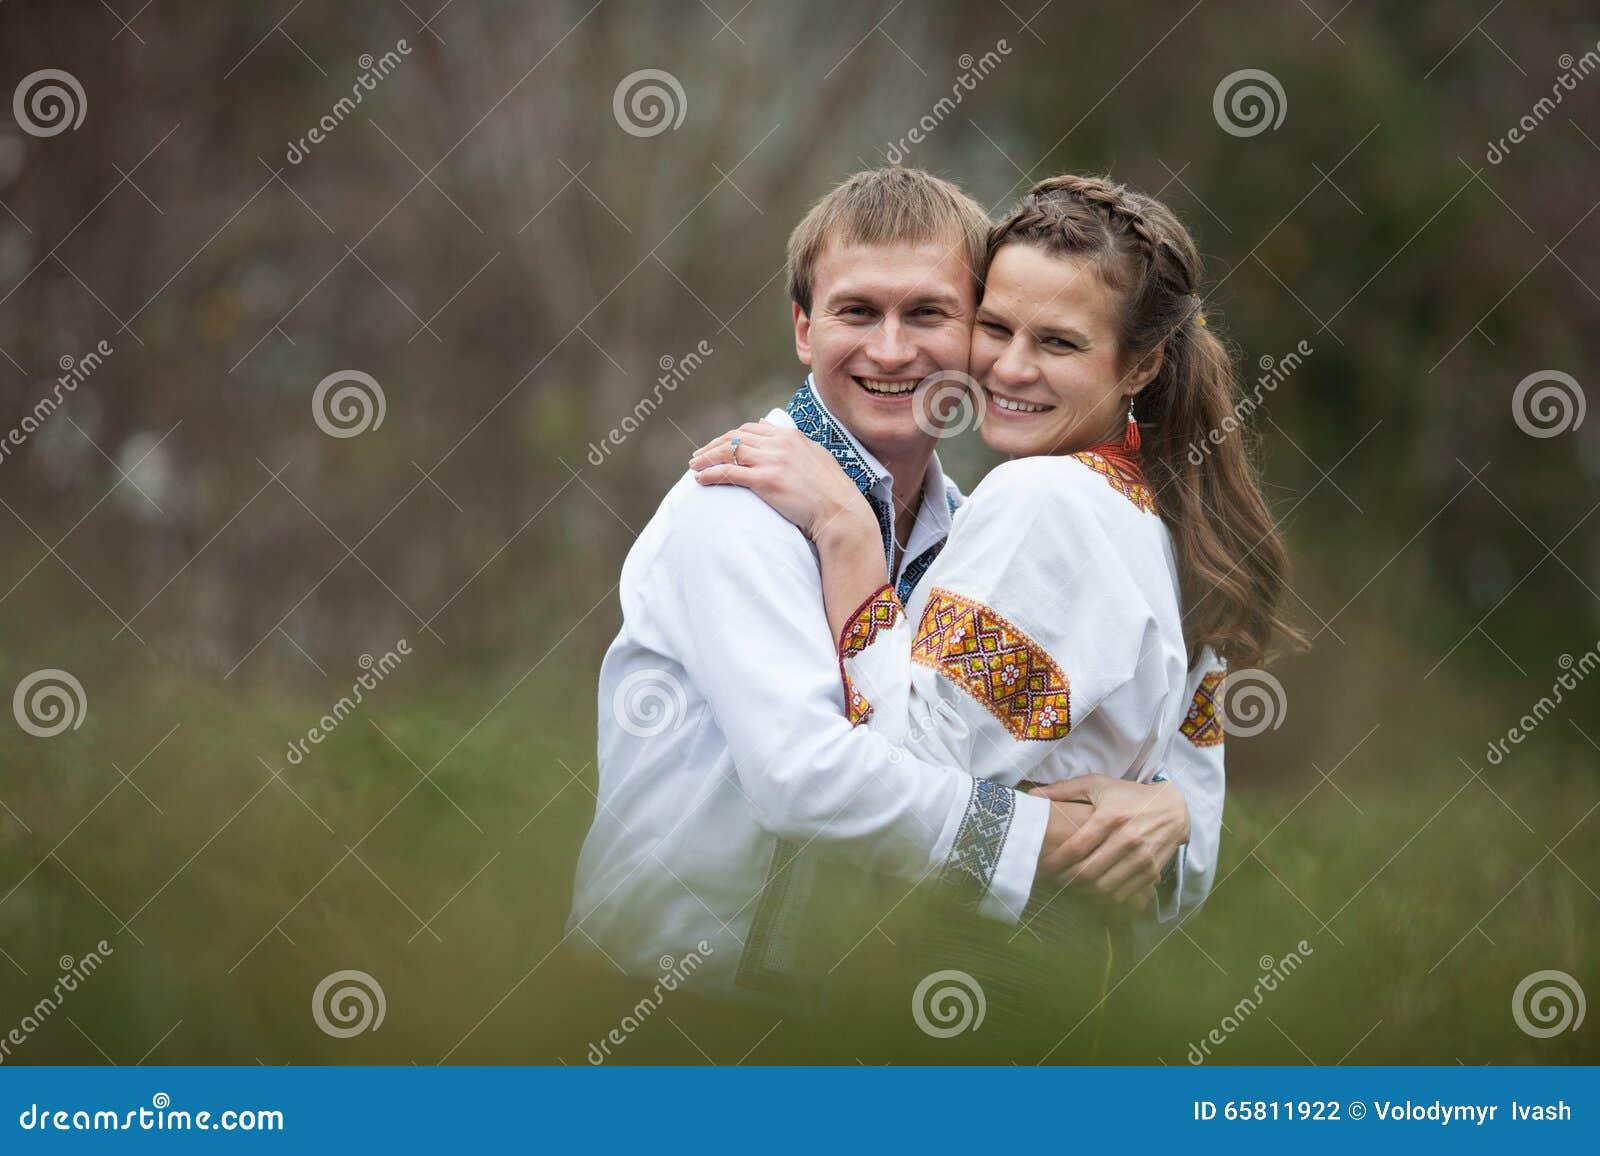 Your Lovely Ukrainian Wife 60